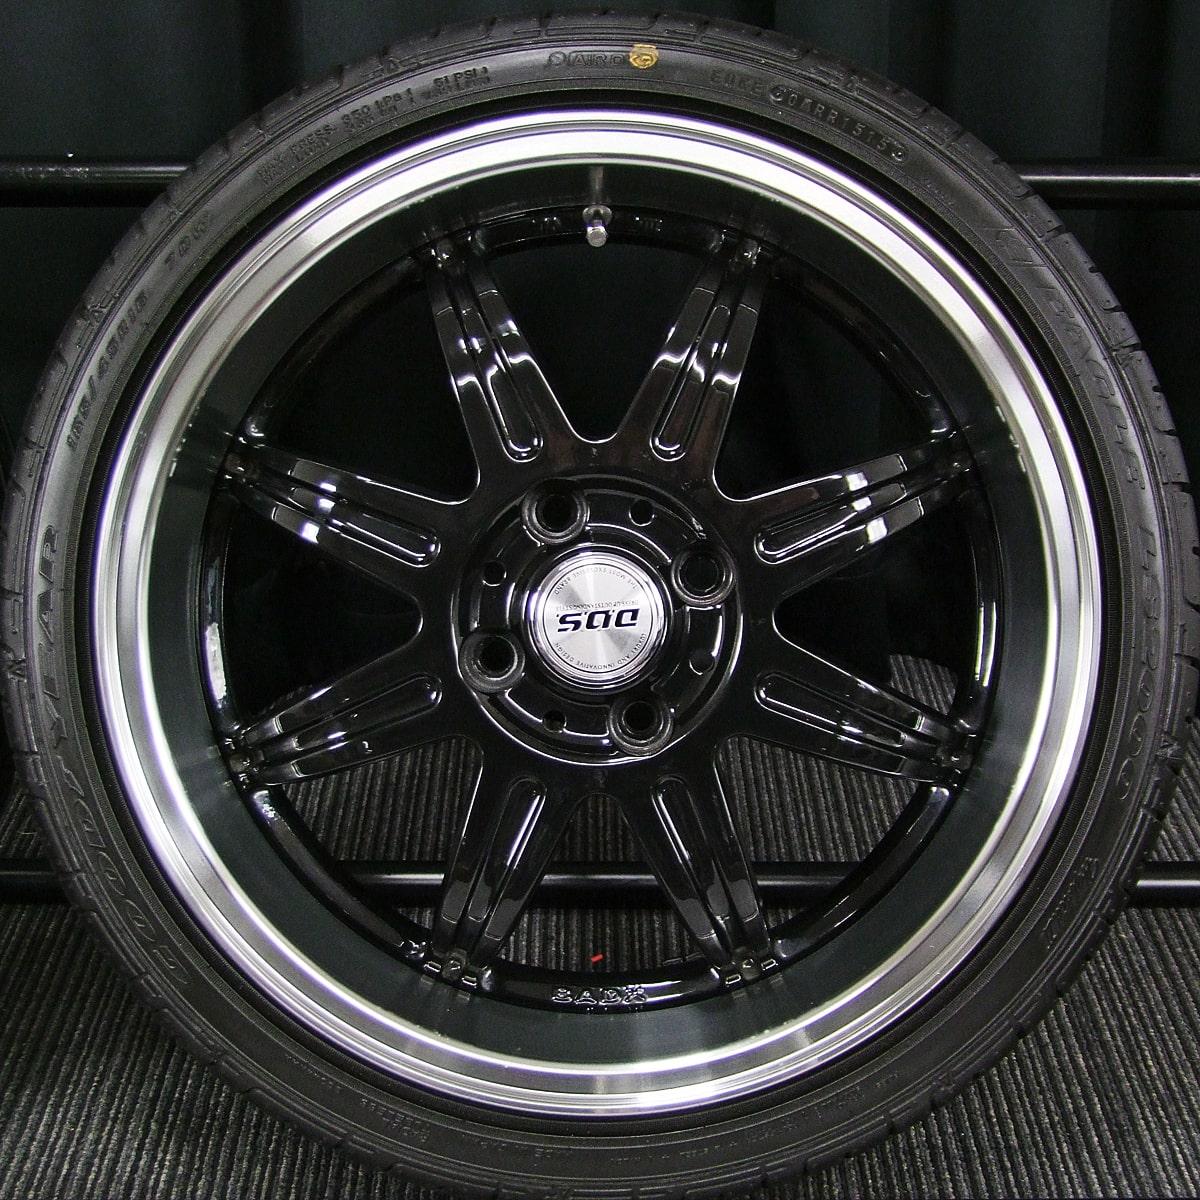 BADX D.O.S. DEEP RIVAGE ブラック GOODYEAR EAGLE LS2000 Hybrid2 165/45R16 4本SET